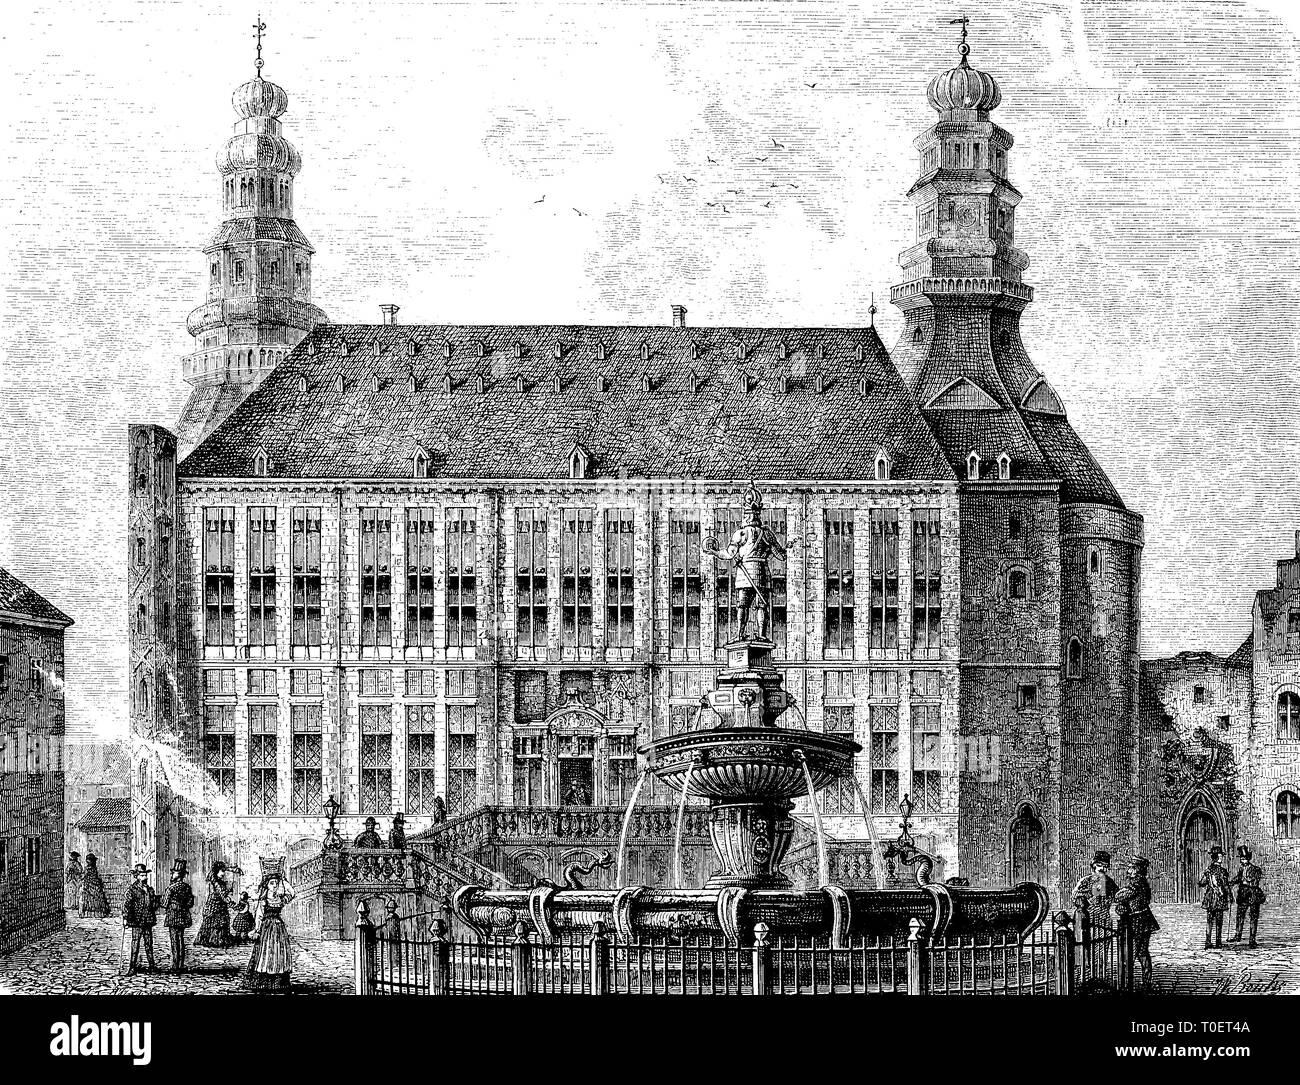 The townhall of Aachen, Germany  /  Das Rathaus in Aachen, Deutschland Stock Photo